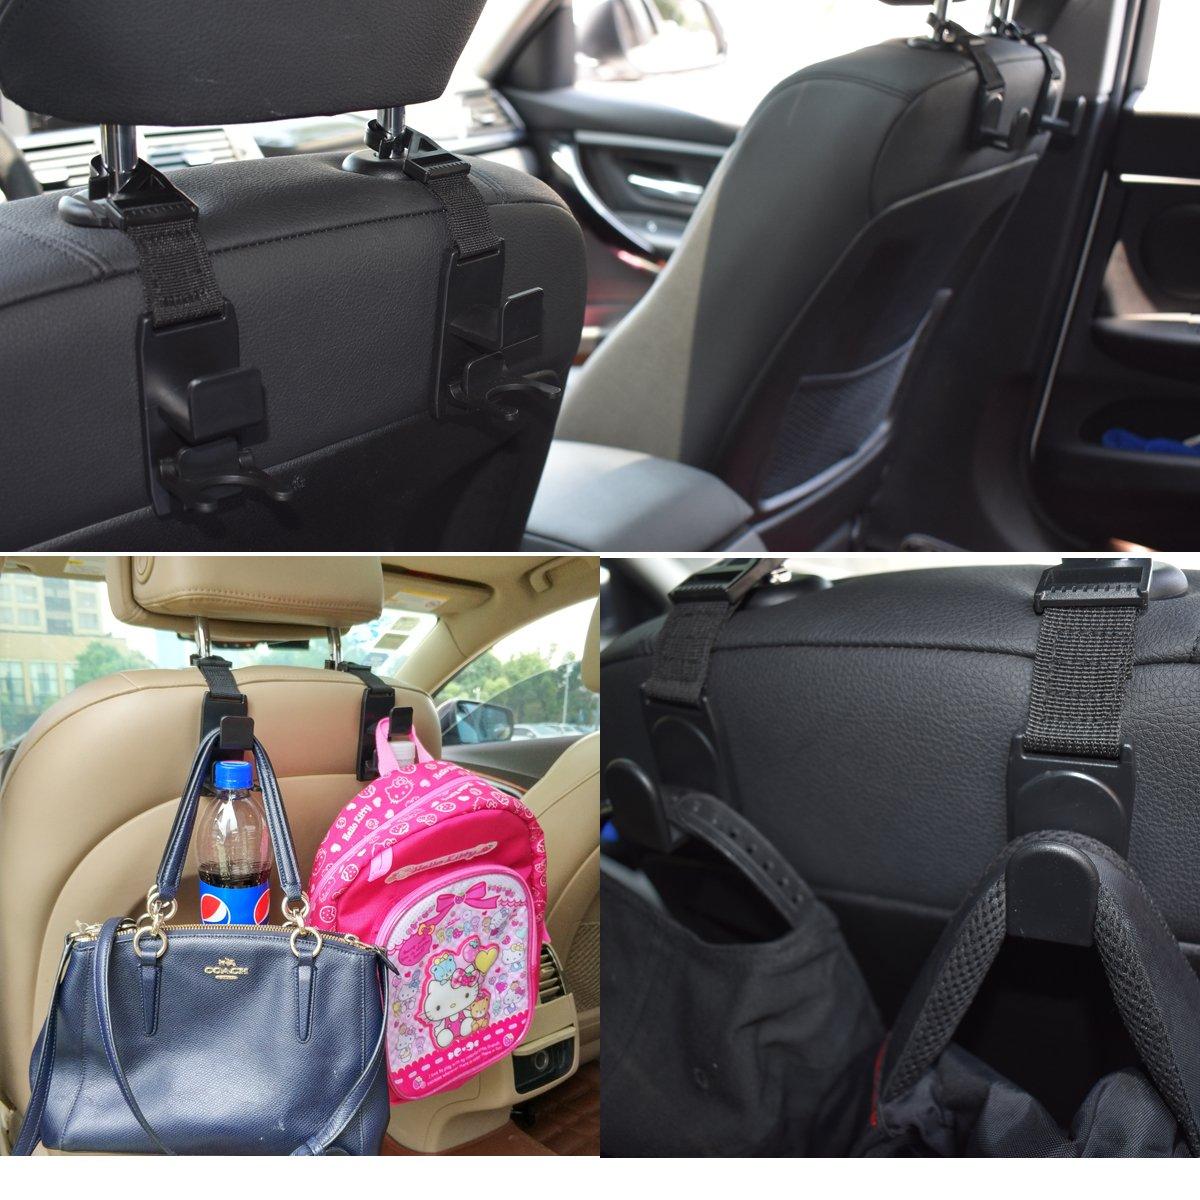 Car Seat Headrest Hooks Hanger Strong Durable Backseat Headrest Hanger Storage For Handbags and Grocery Bags Universal Vehicle Car Seat Back Headrest Bottle Holder 4 Pack Purses HOOKS-2 Coats